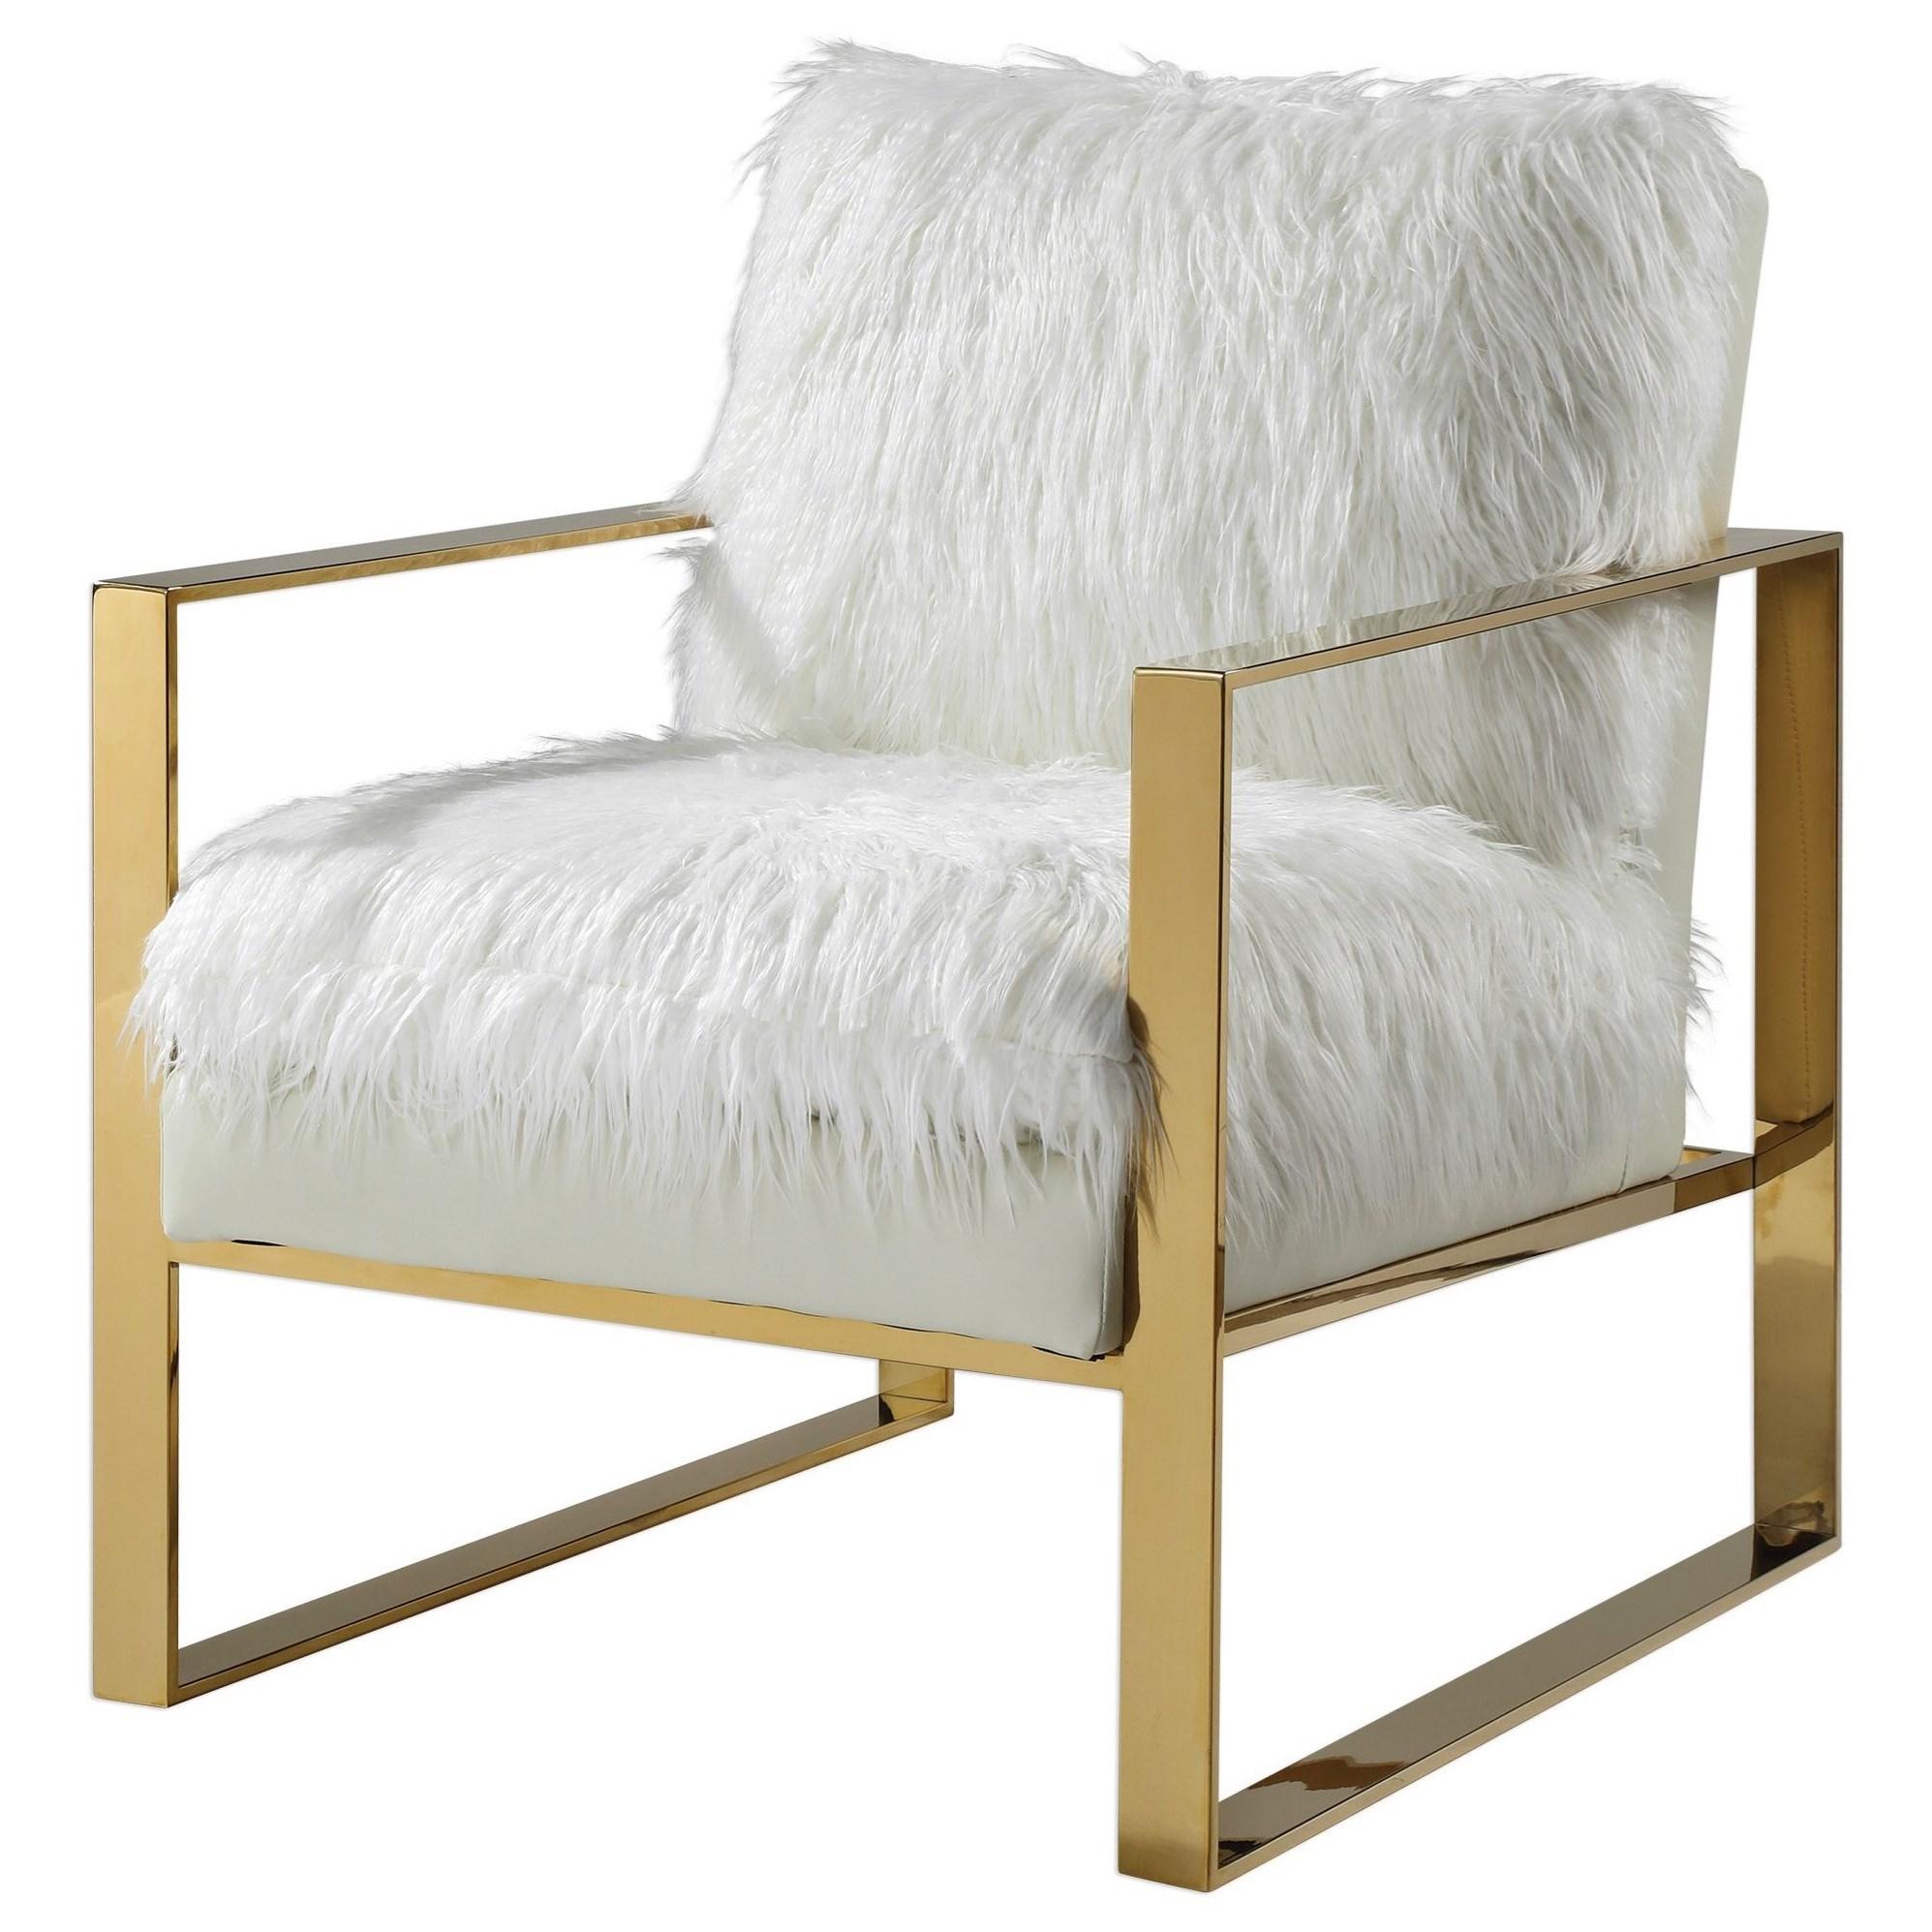 Accent Furniture - Accent Chairs Delphine White Accent Chair by Uttermost at Reid's Furniture